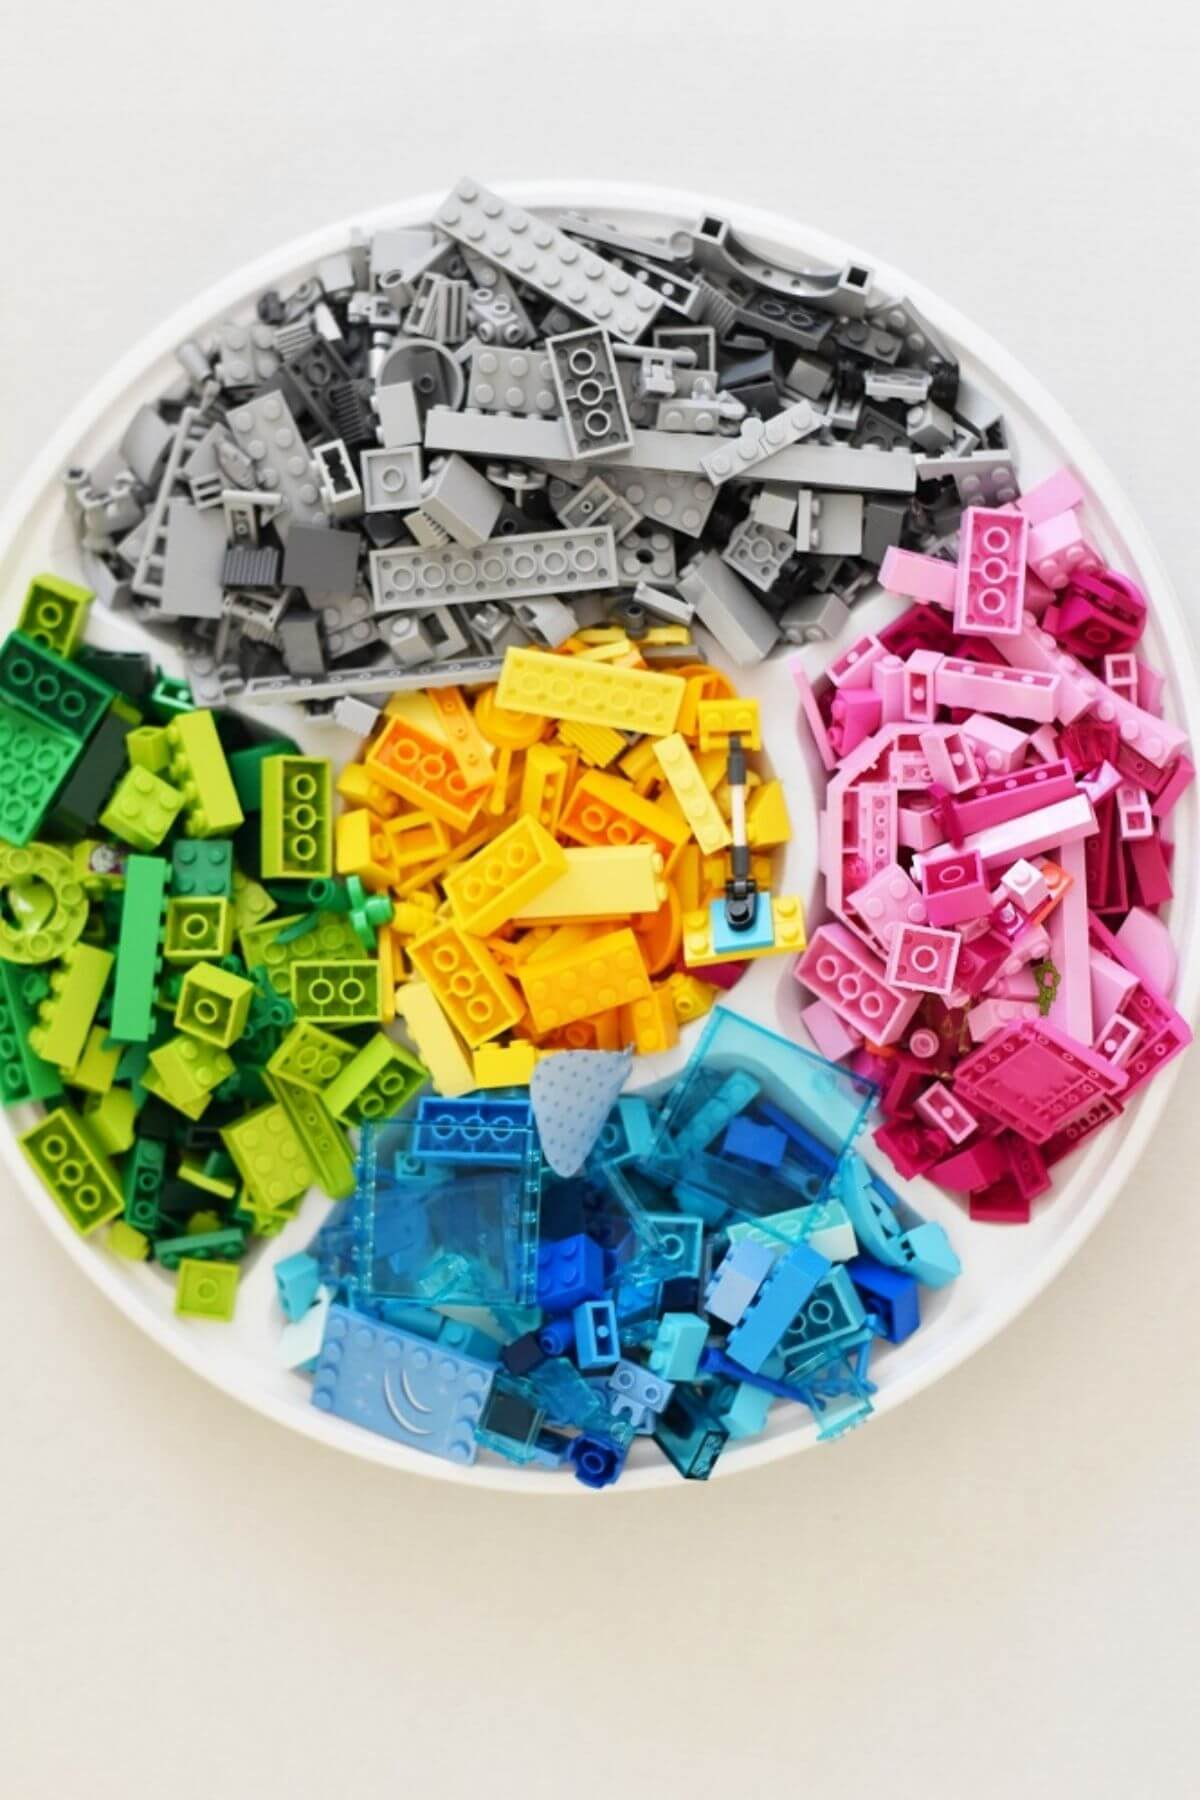 Best lego storage ideas 5 the best lego storage ideas (plus storage ideas for built sets